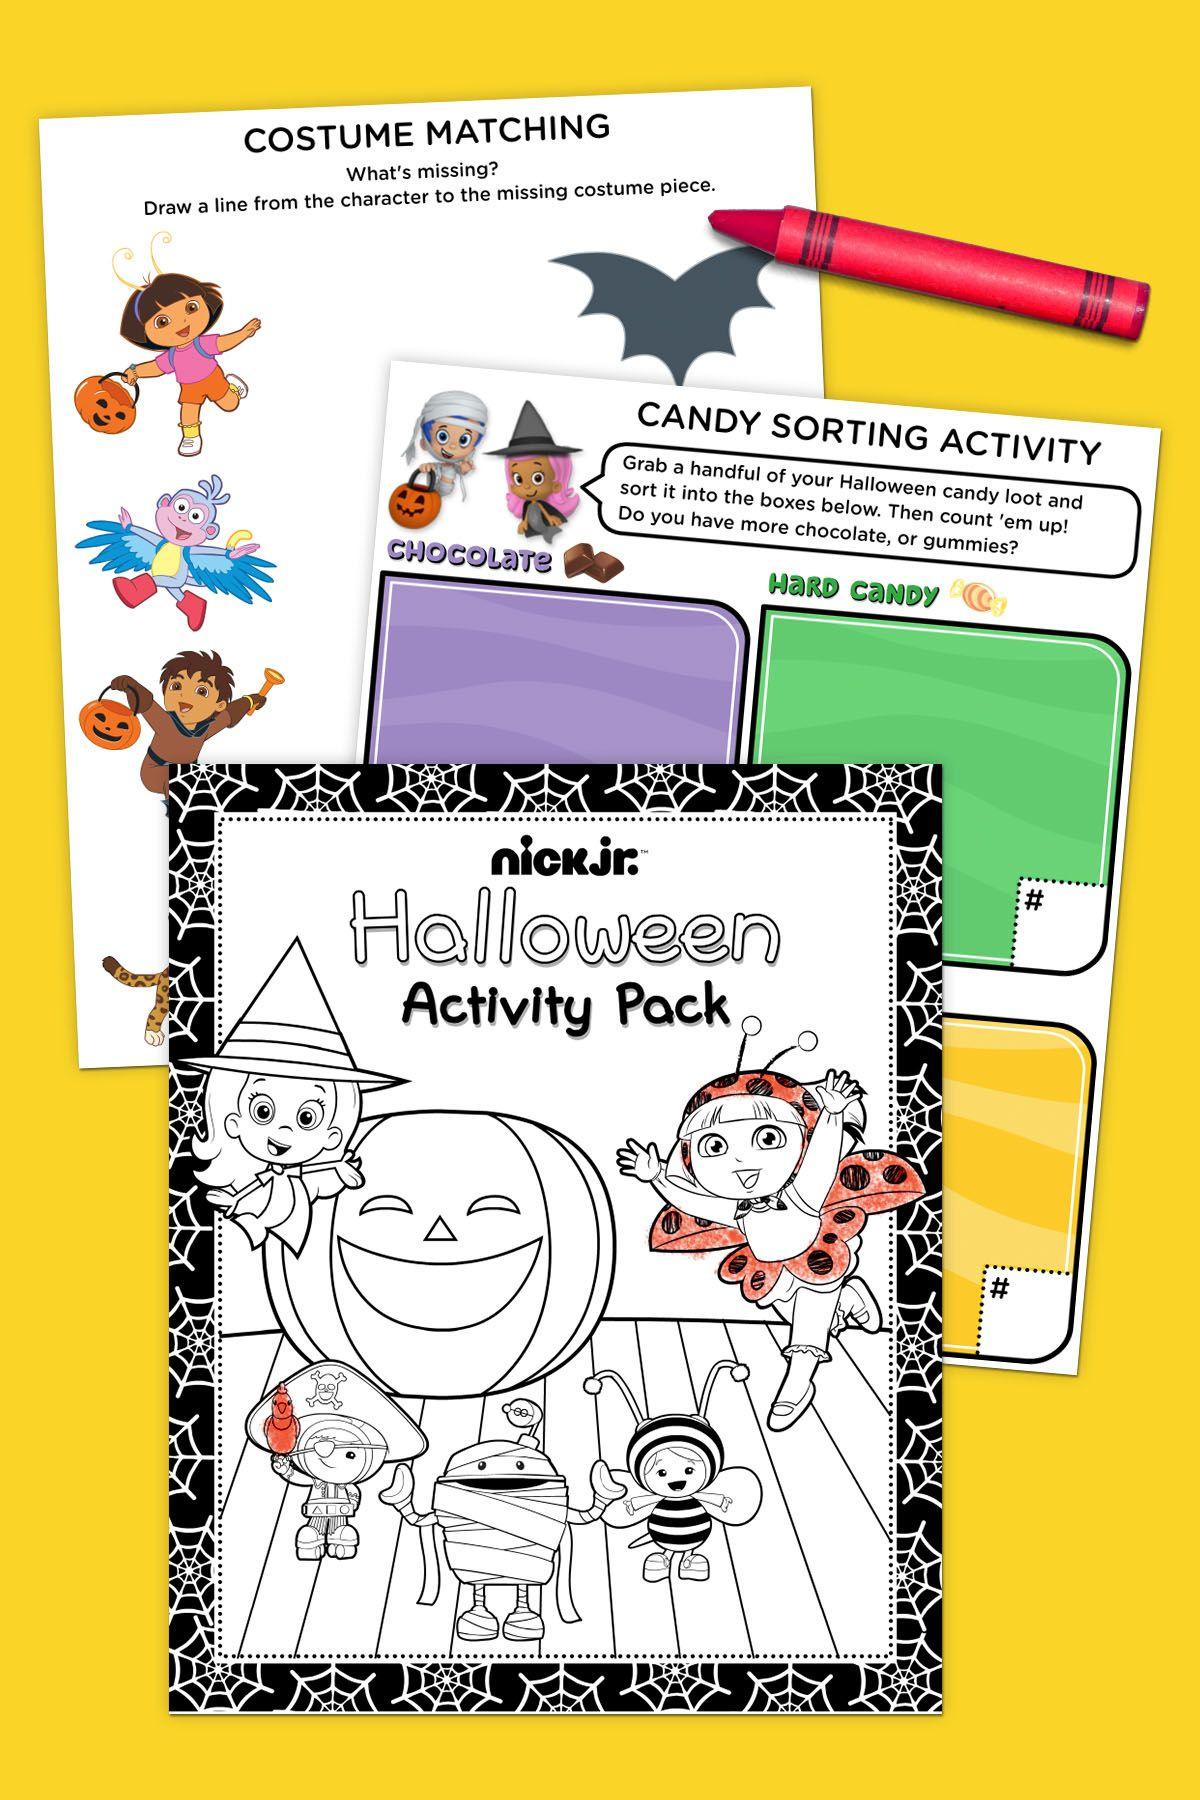 Nick Jr. Halloween Activity Pack | activity books/sheets | Pinterest